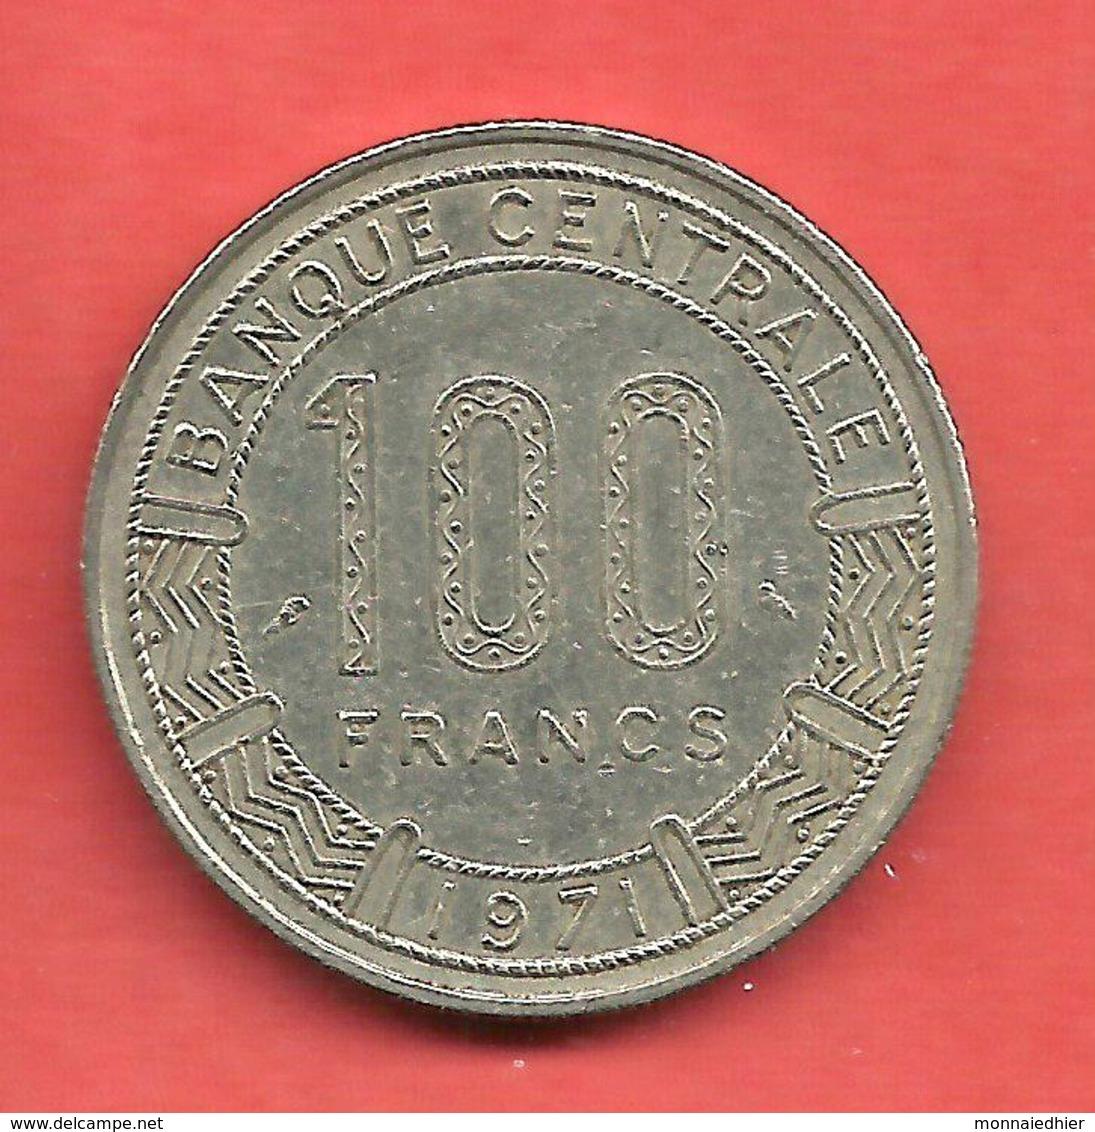 100 Francs , CONGO , Nickel , 1971 , N° KM # 1 - Kongo (Dem. Republik 1998)